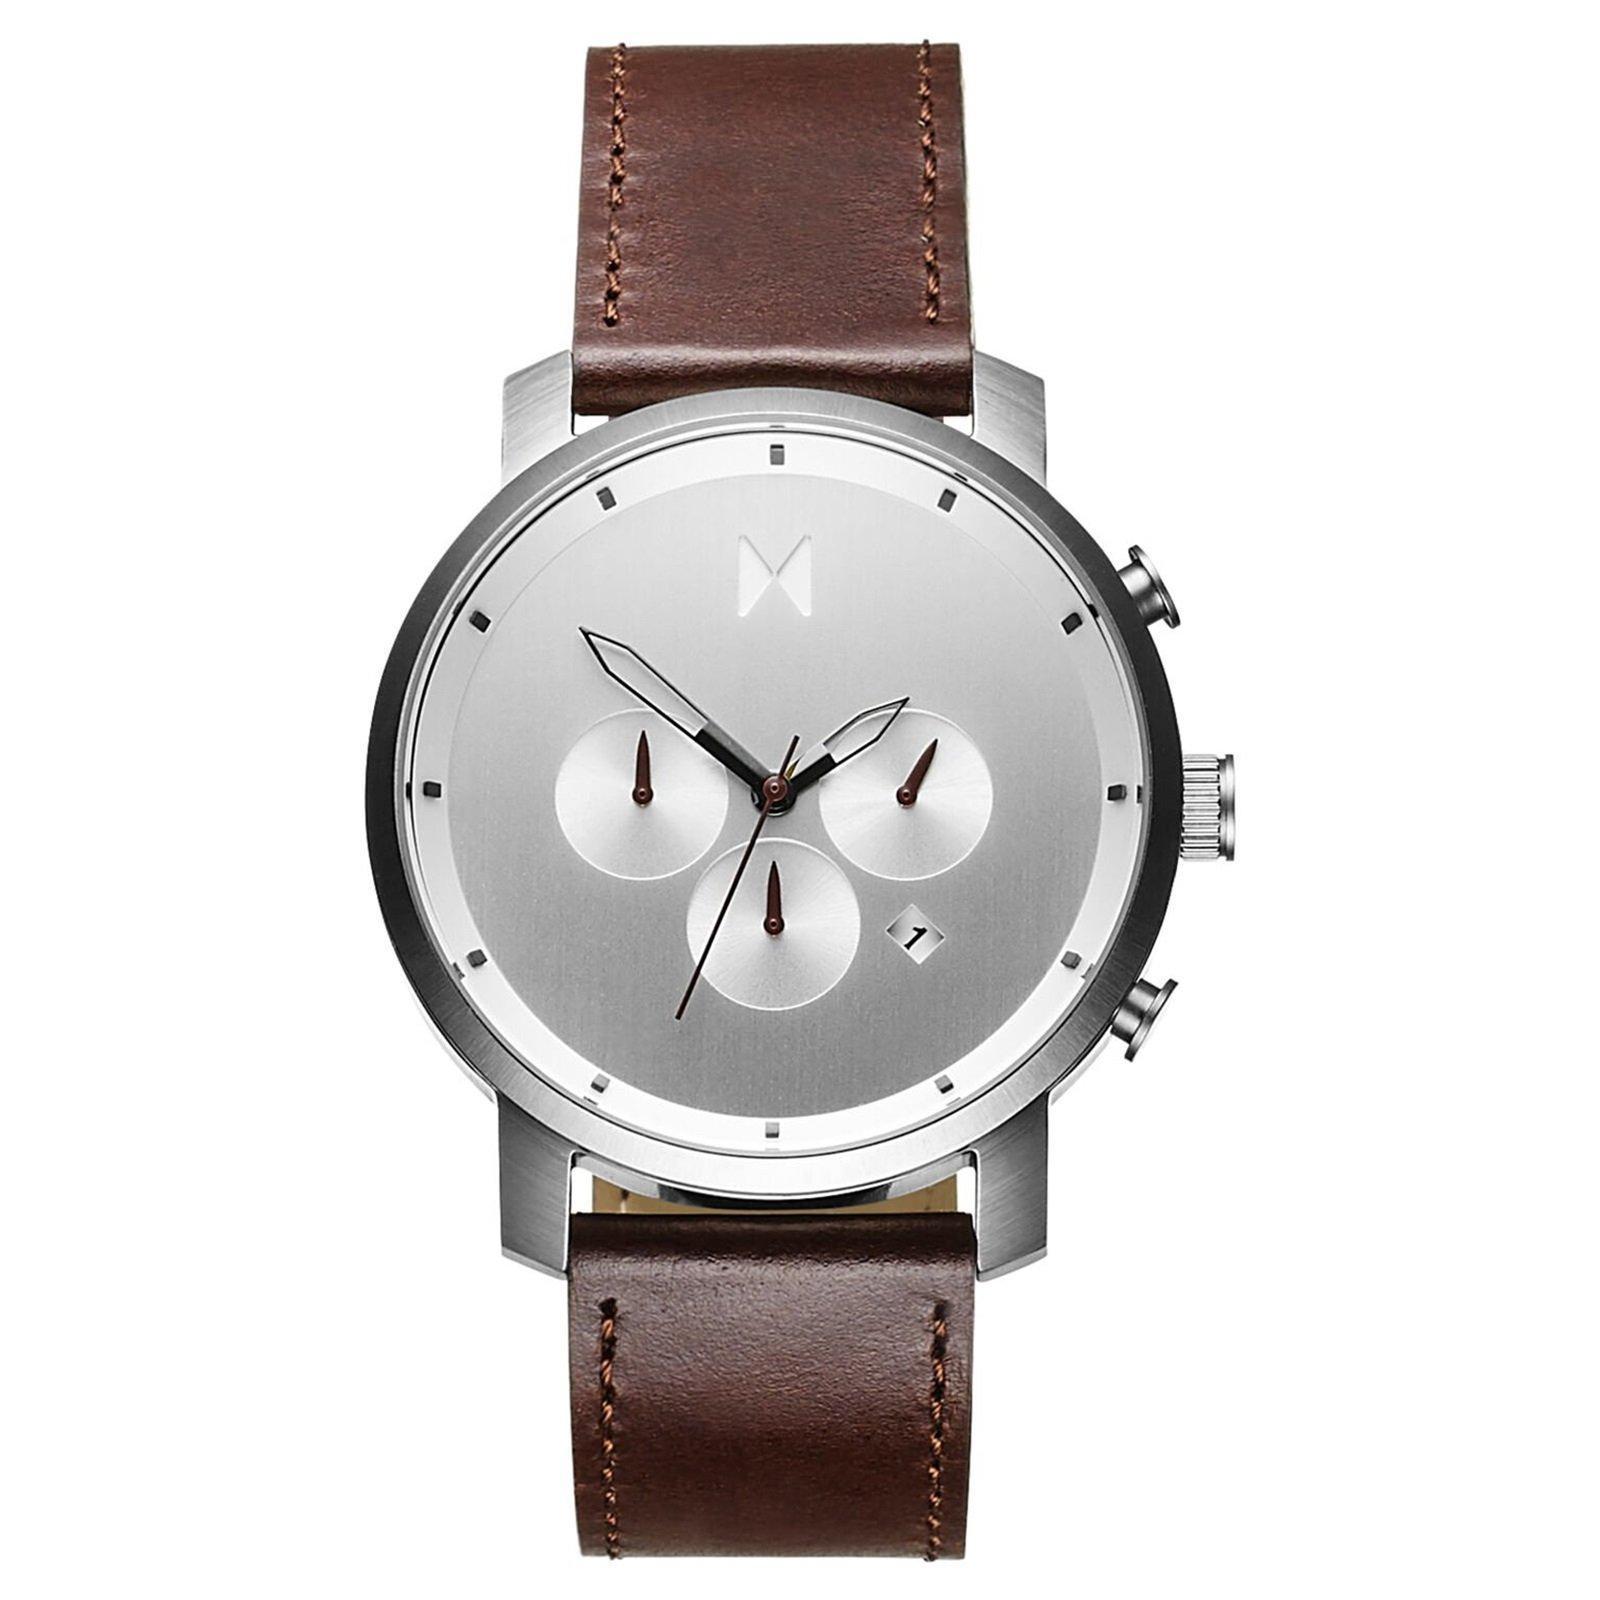 MVMT Chrono Chronograph Men's Watch